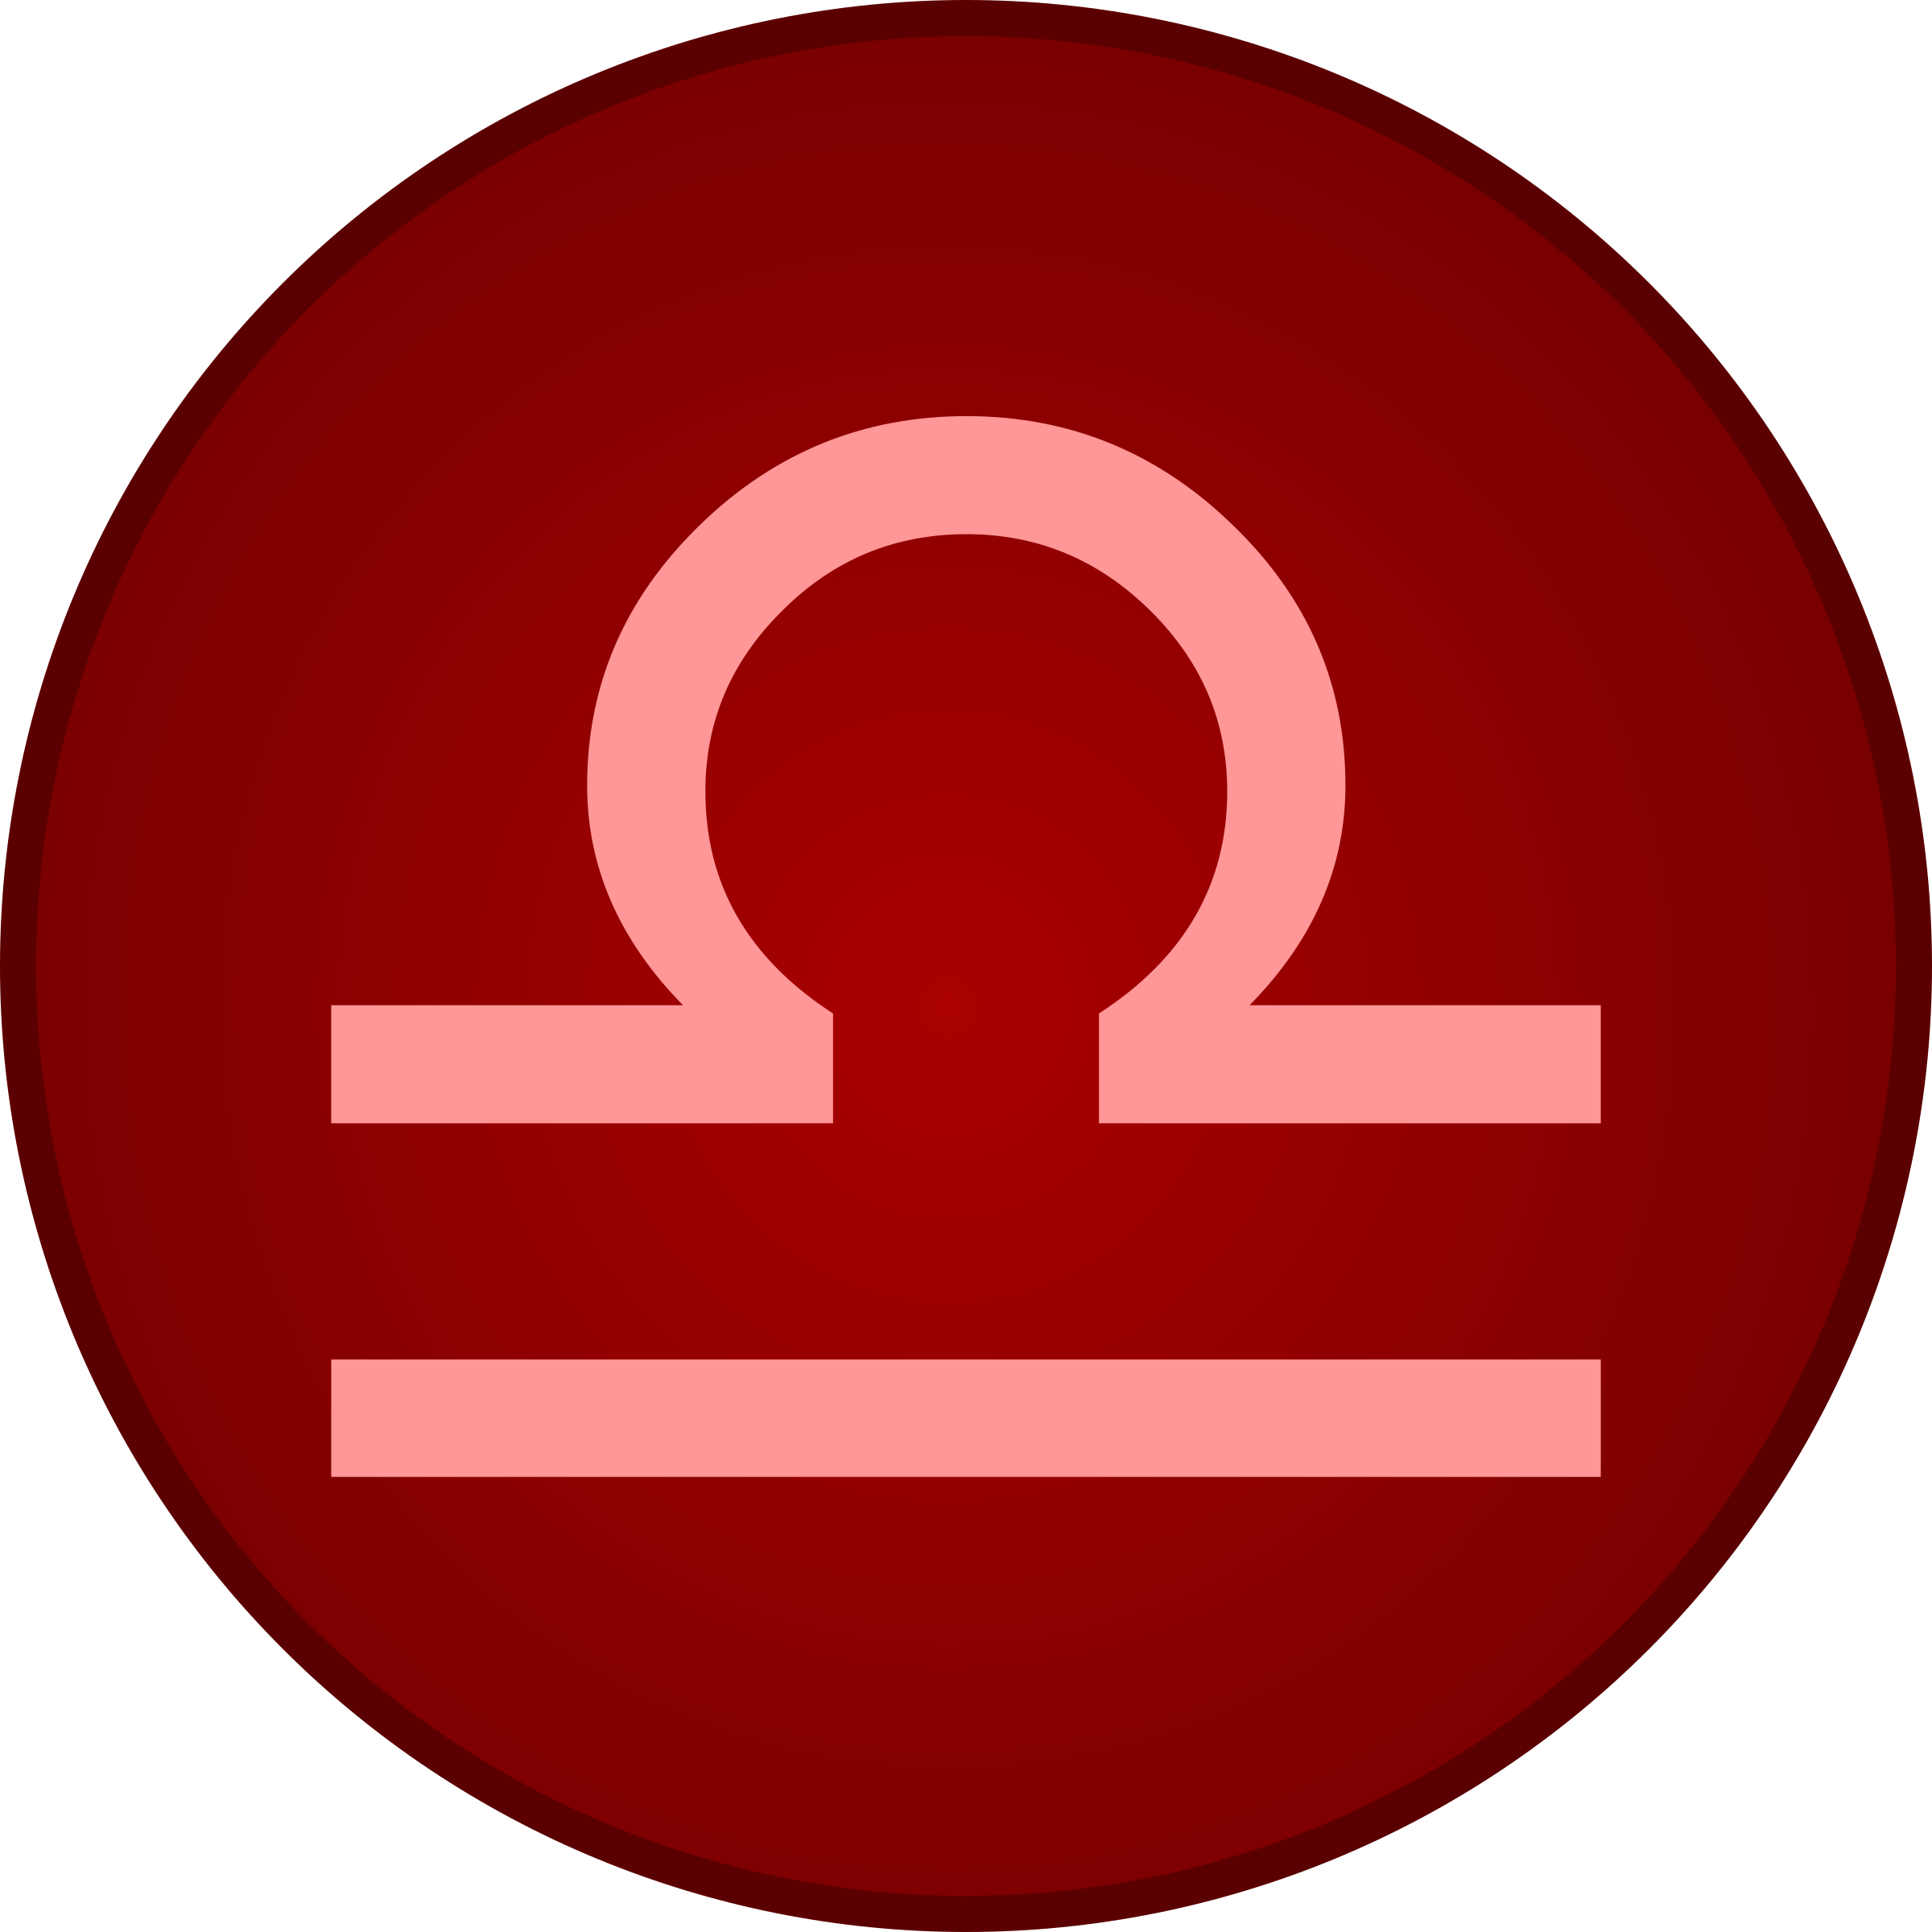 2400x2400 Libra Symbol Icons Png